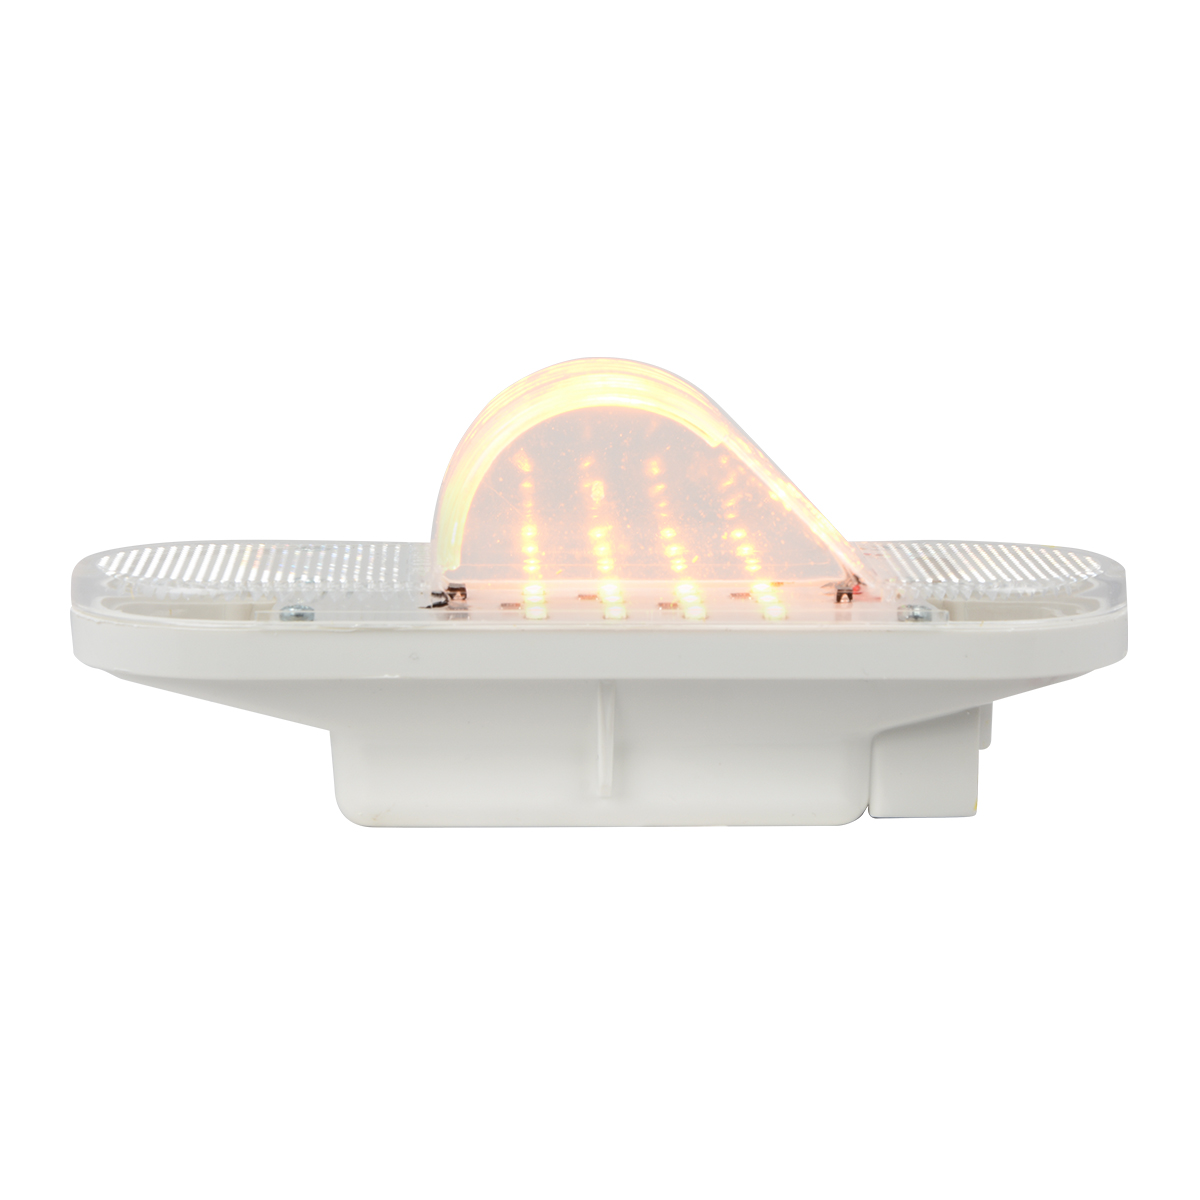 79996 Oval Side Marker & Turn 12 LED Light w/ Reflector